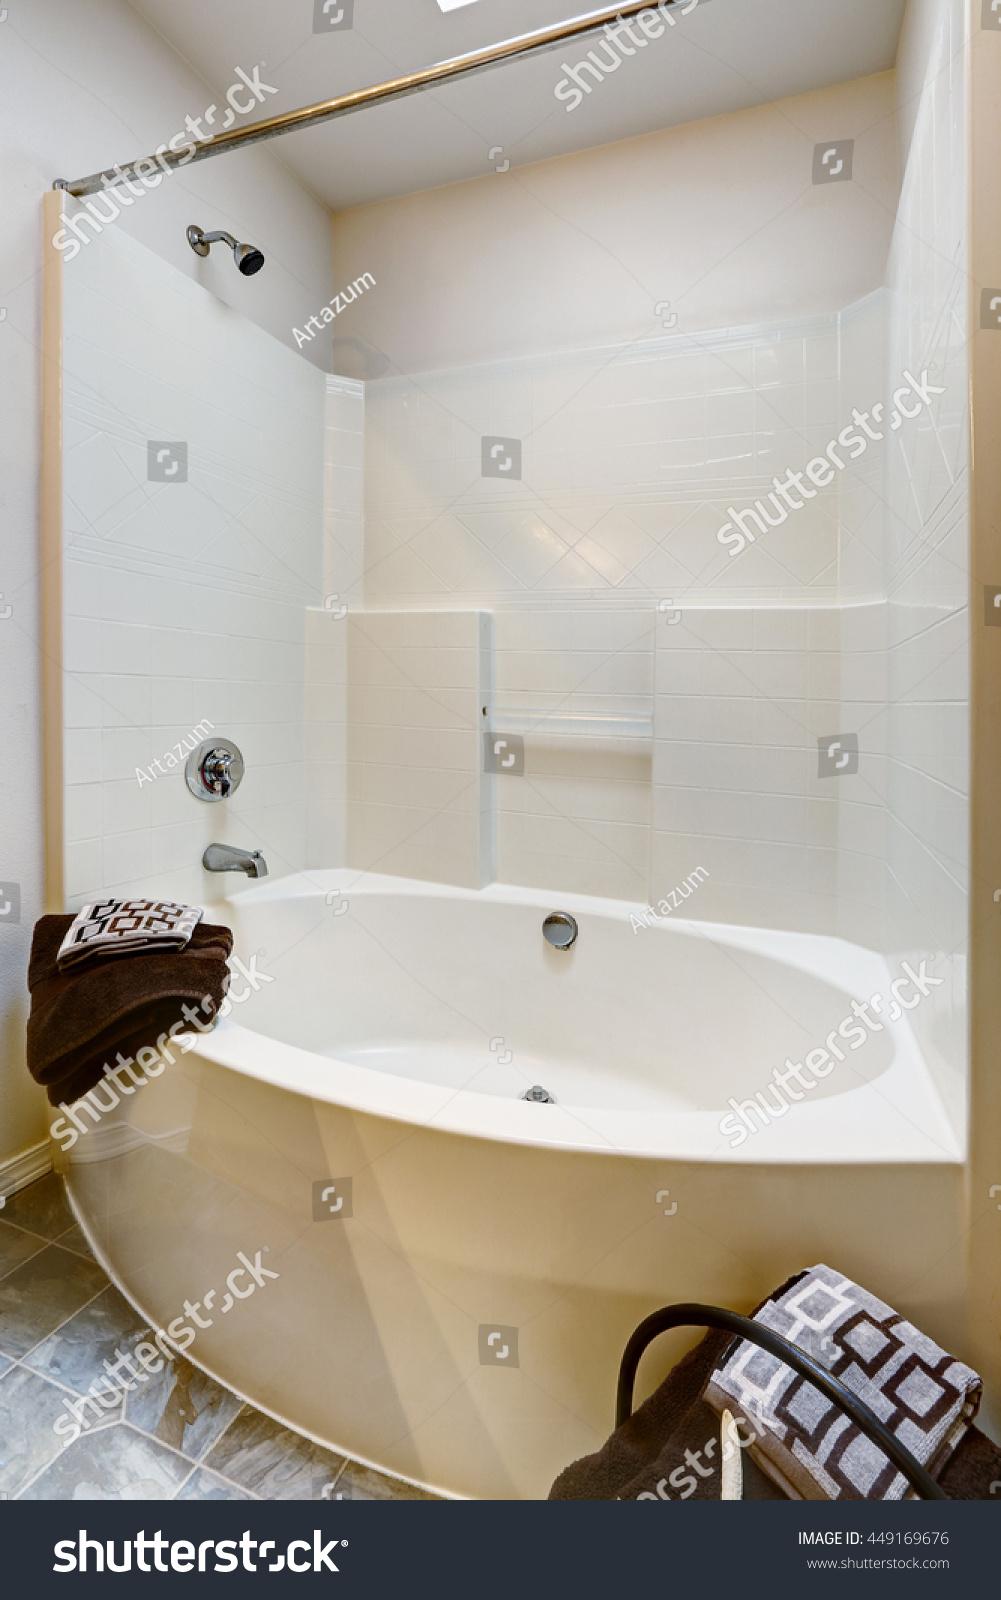 New bathroom with tile floor and white bathtub. | EZ Canvas